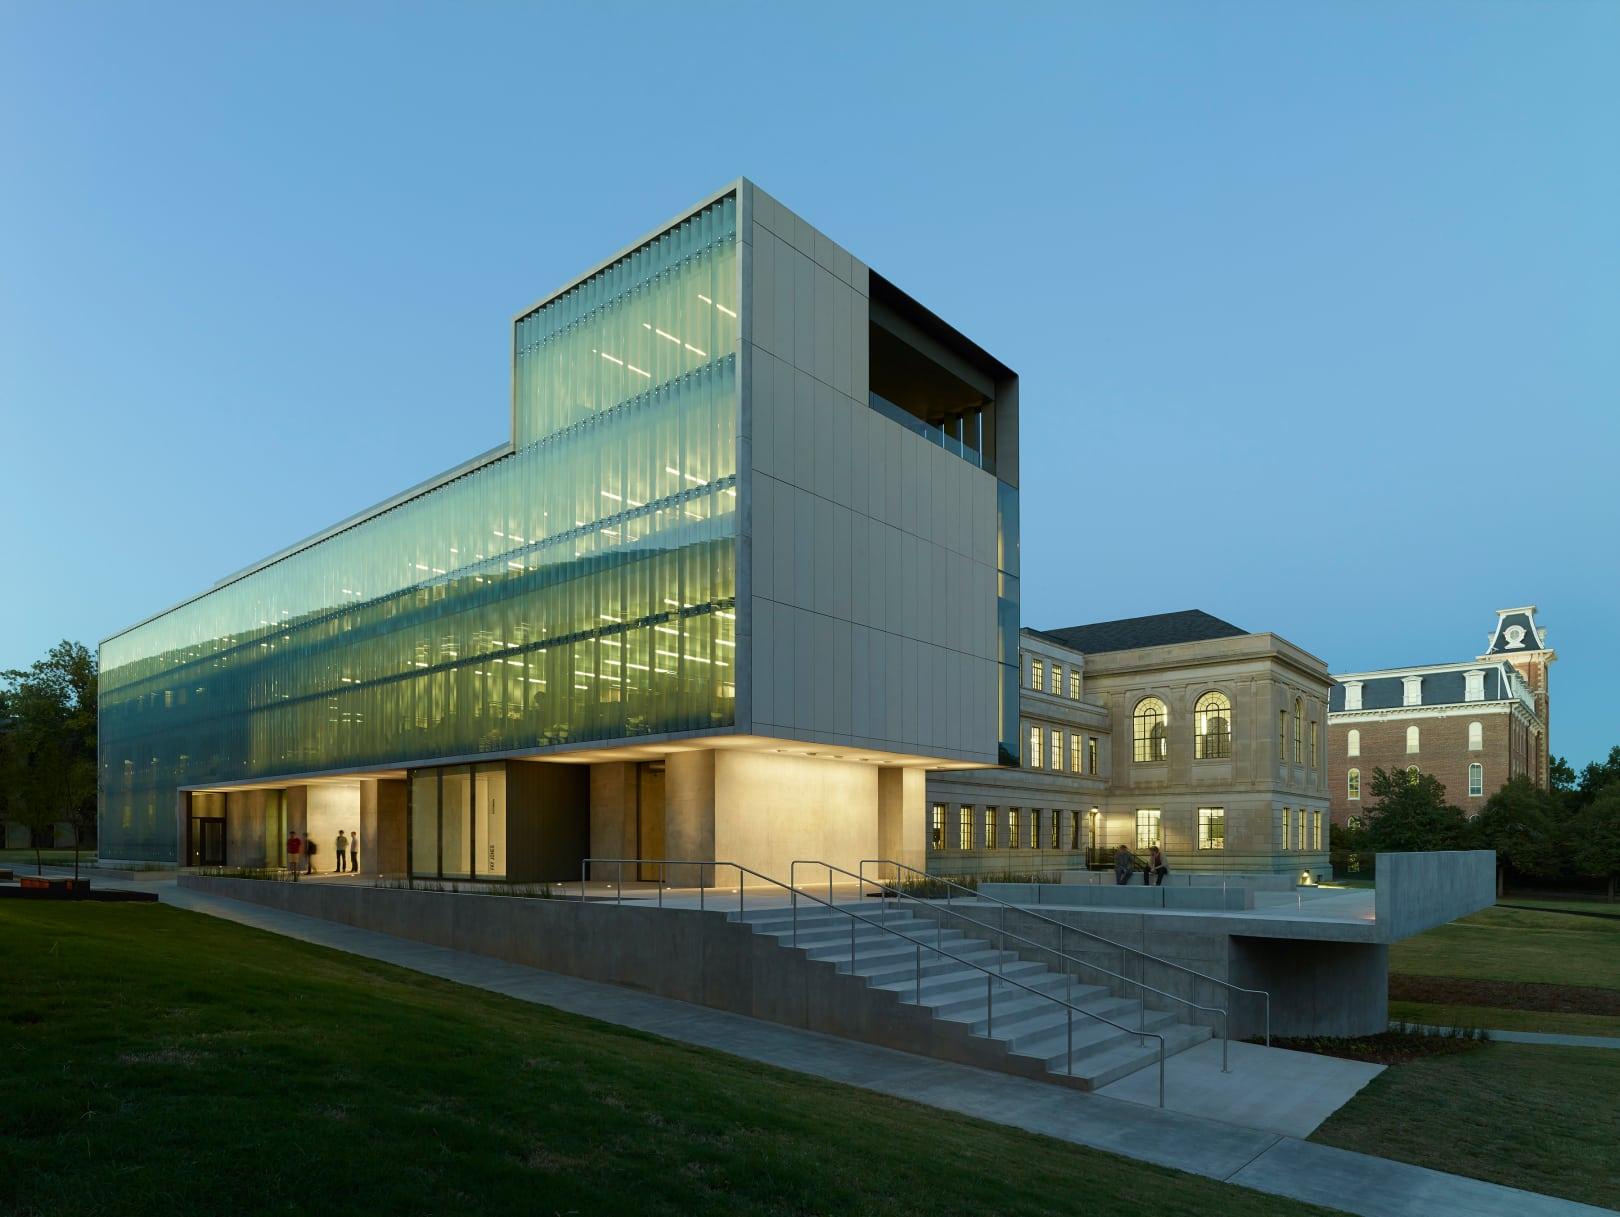 Vol Walker Hall Renovation & The Steven L. Anderson Design Center